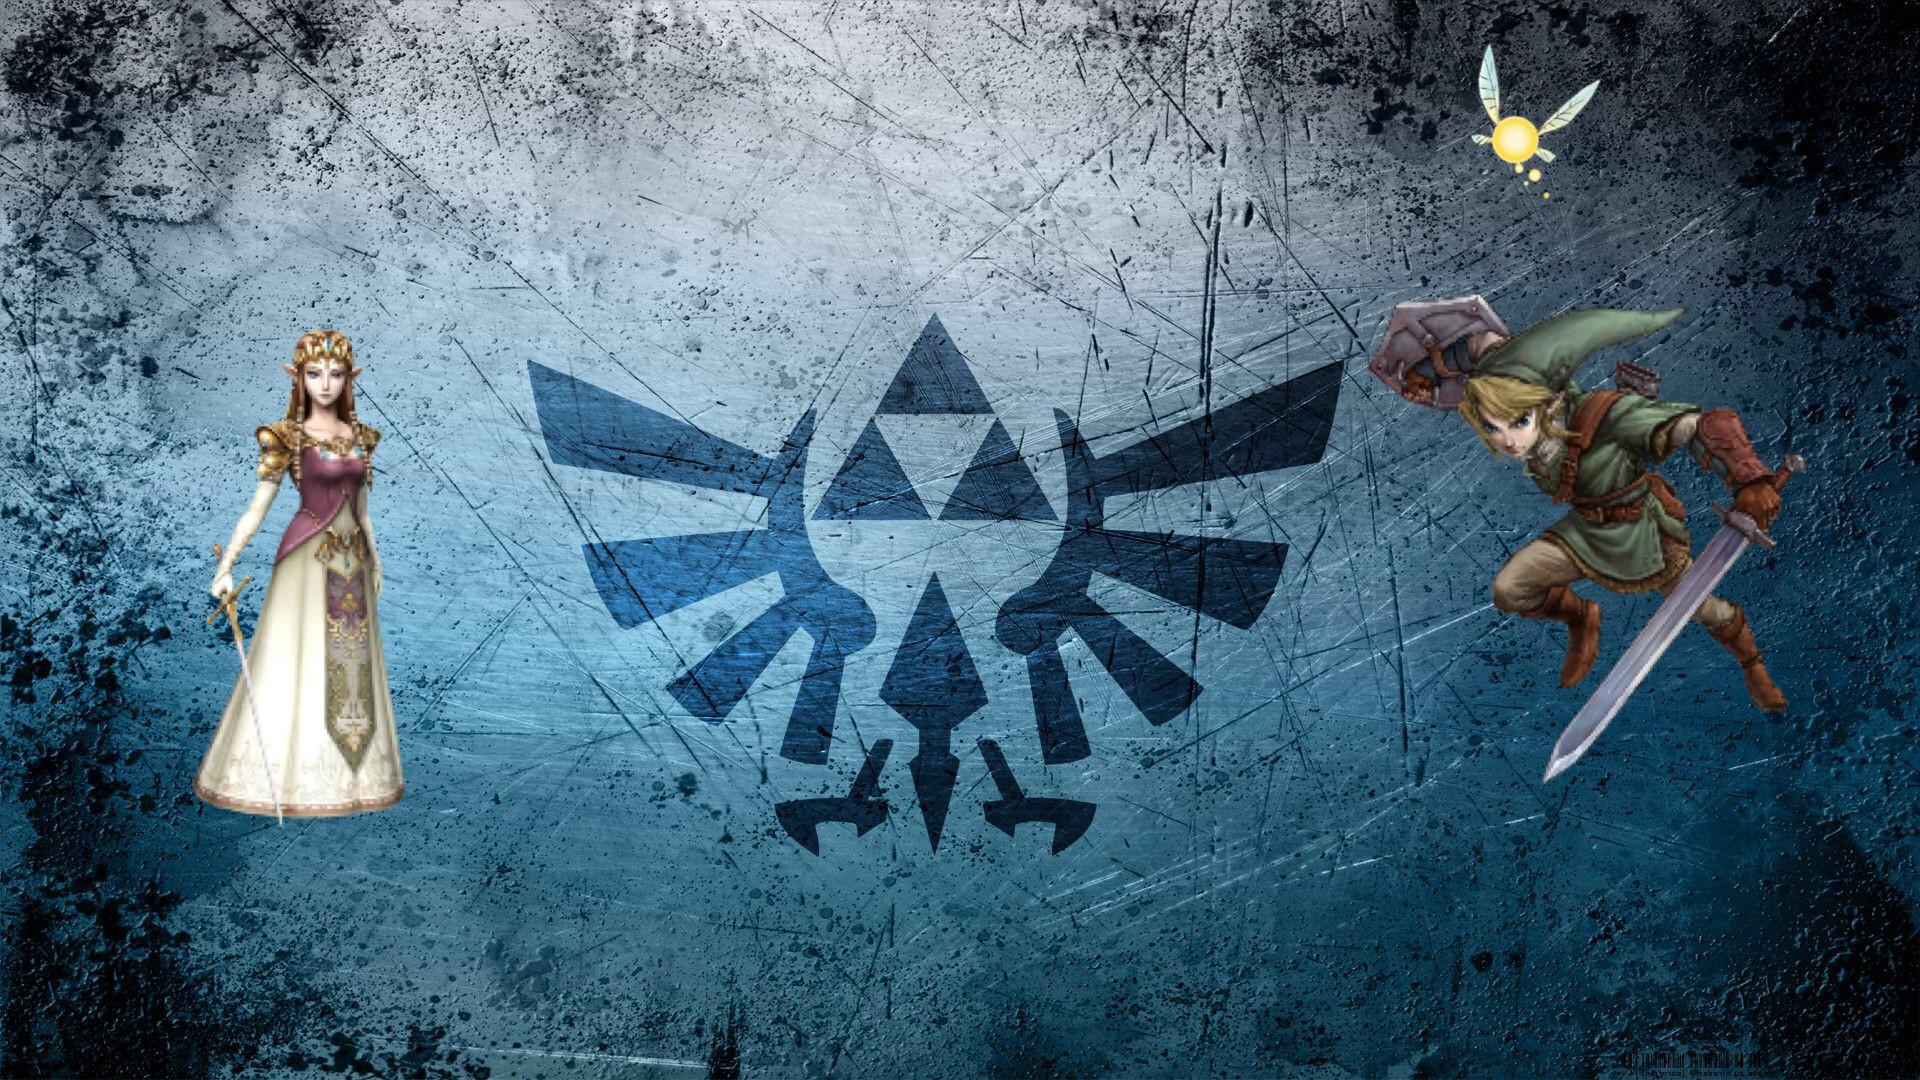 The Legend Of Zelda Majora Mask Wallpaper Games HD Wallpapers Zelda Android Wallpapers  Wallpapers)